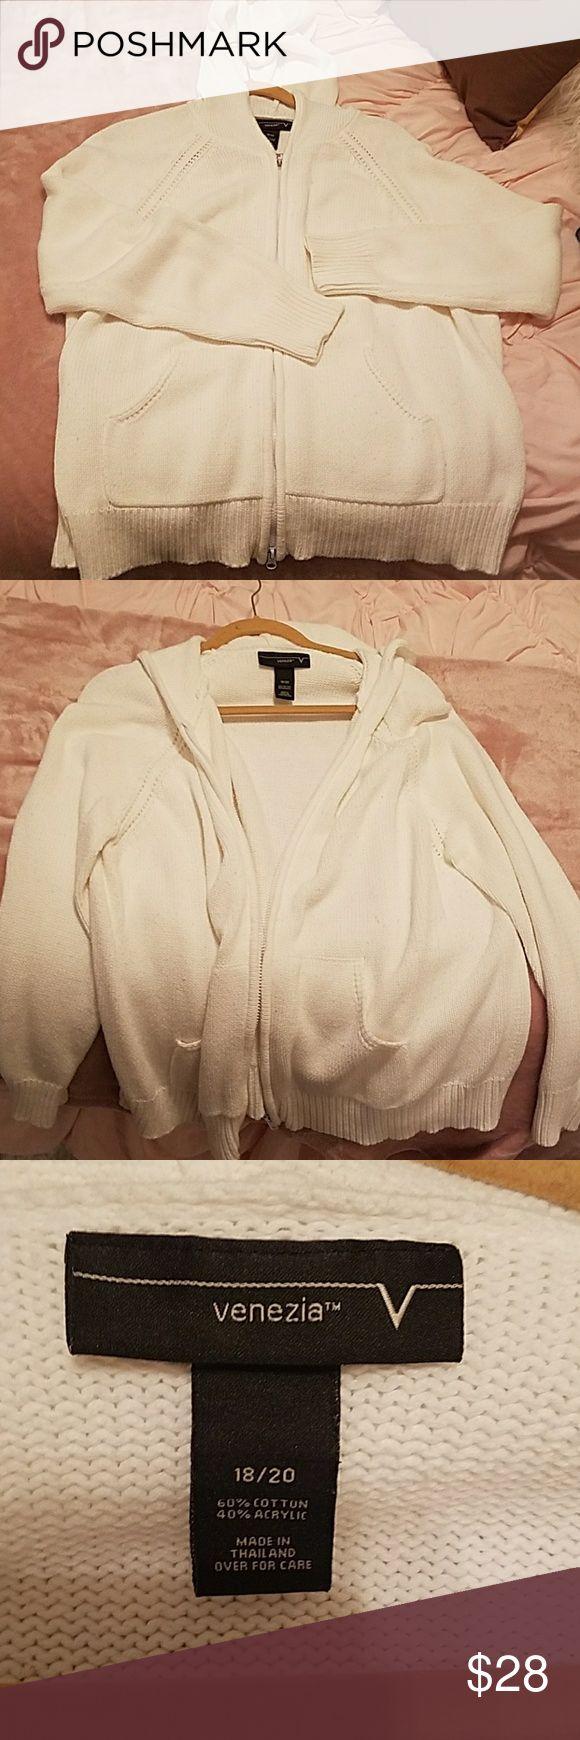 White zip up knitted sweater White zip up knitted sweater Venezia Sweaters